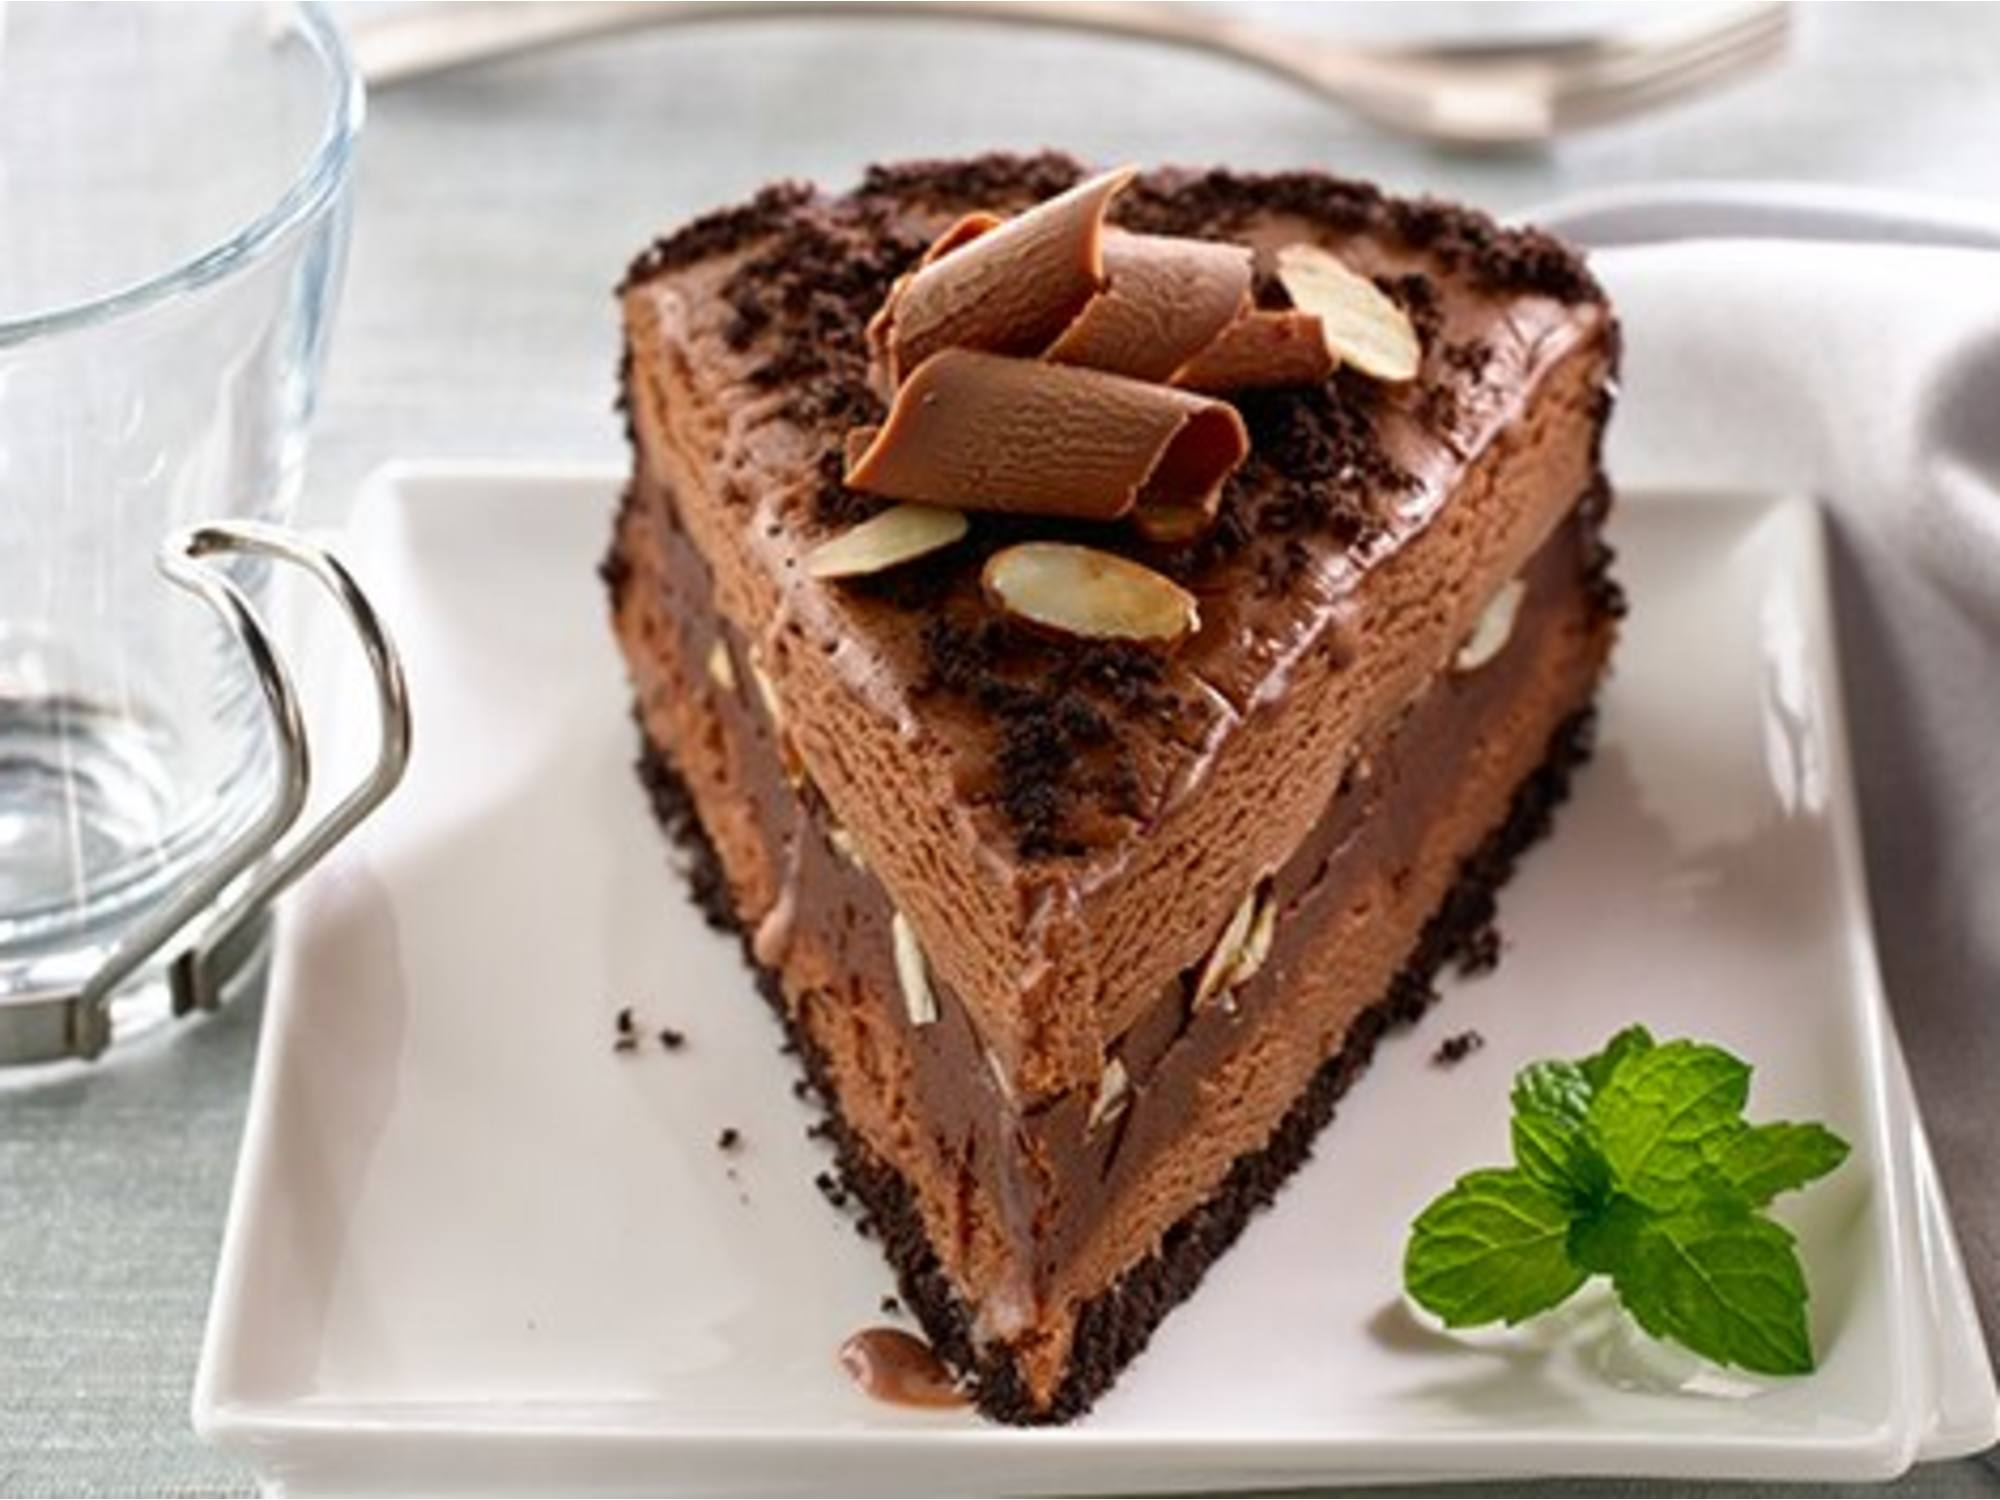 Mocha Almond Fudge Ice Cream Torte Recipe